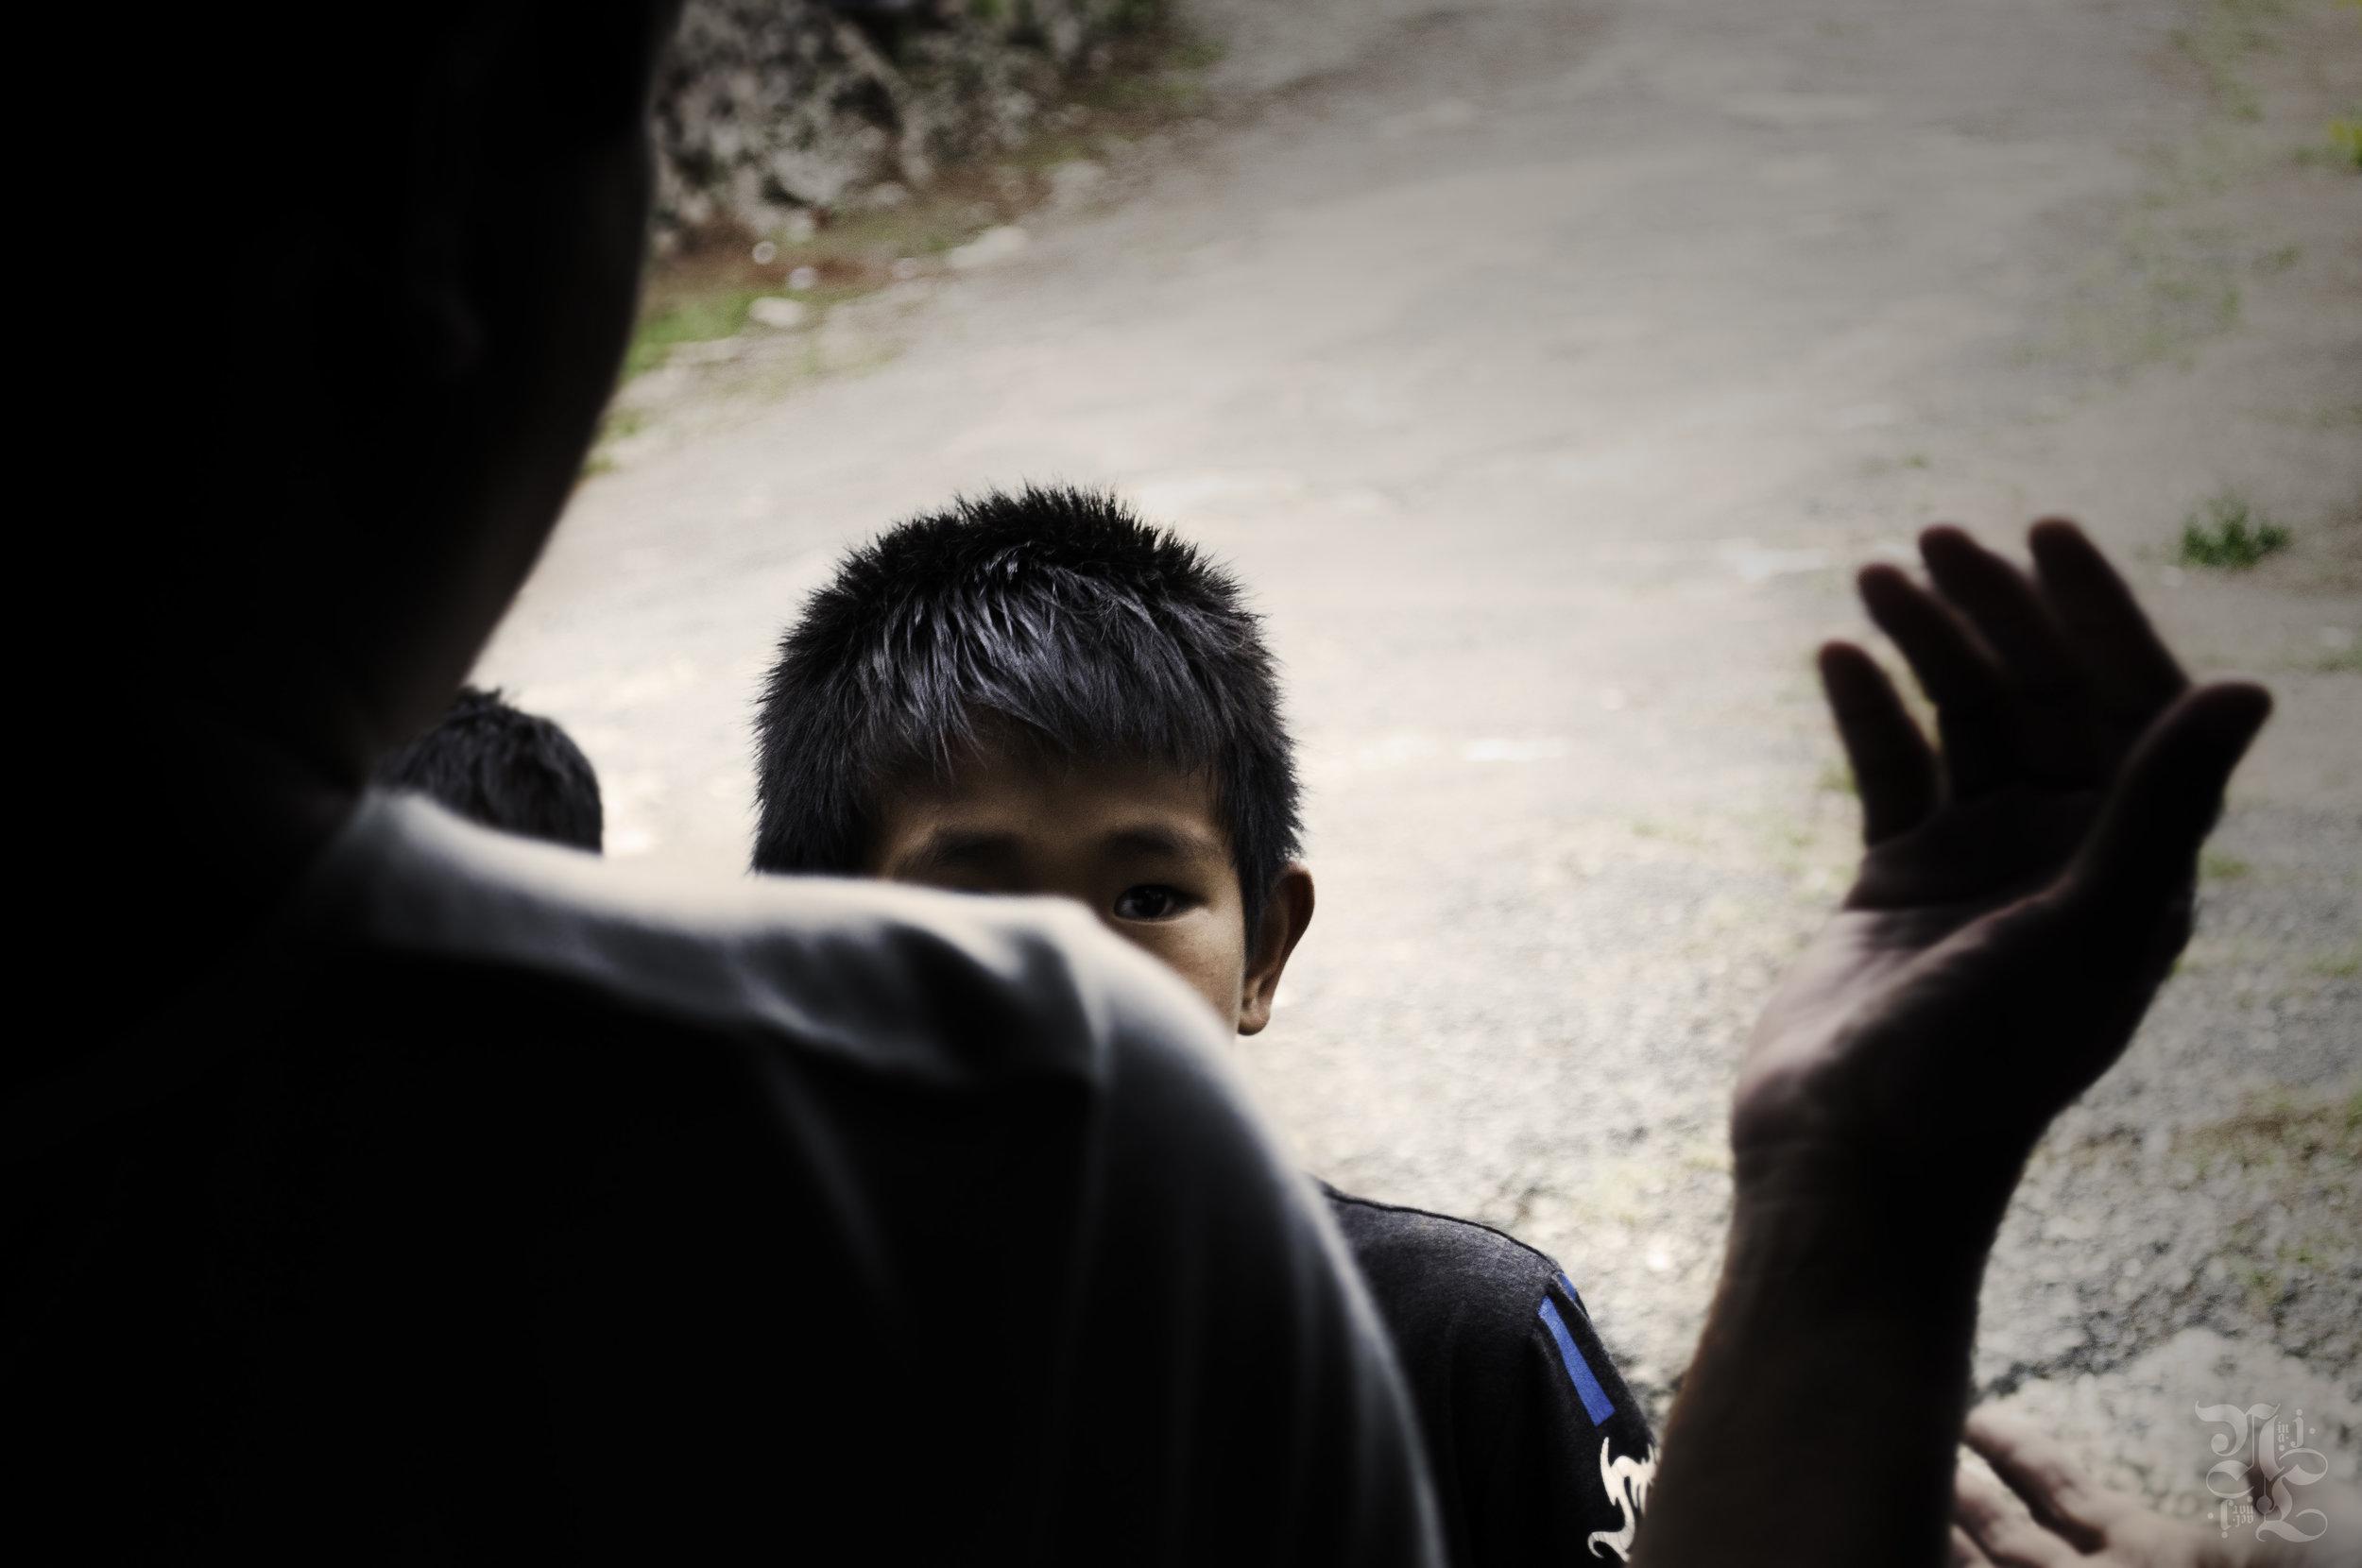 11 yr old boy selling chokoes by a grotto